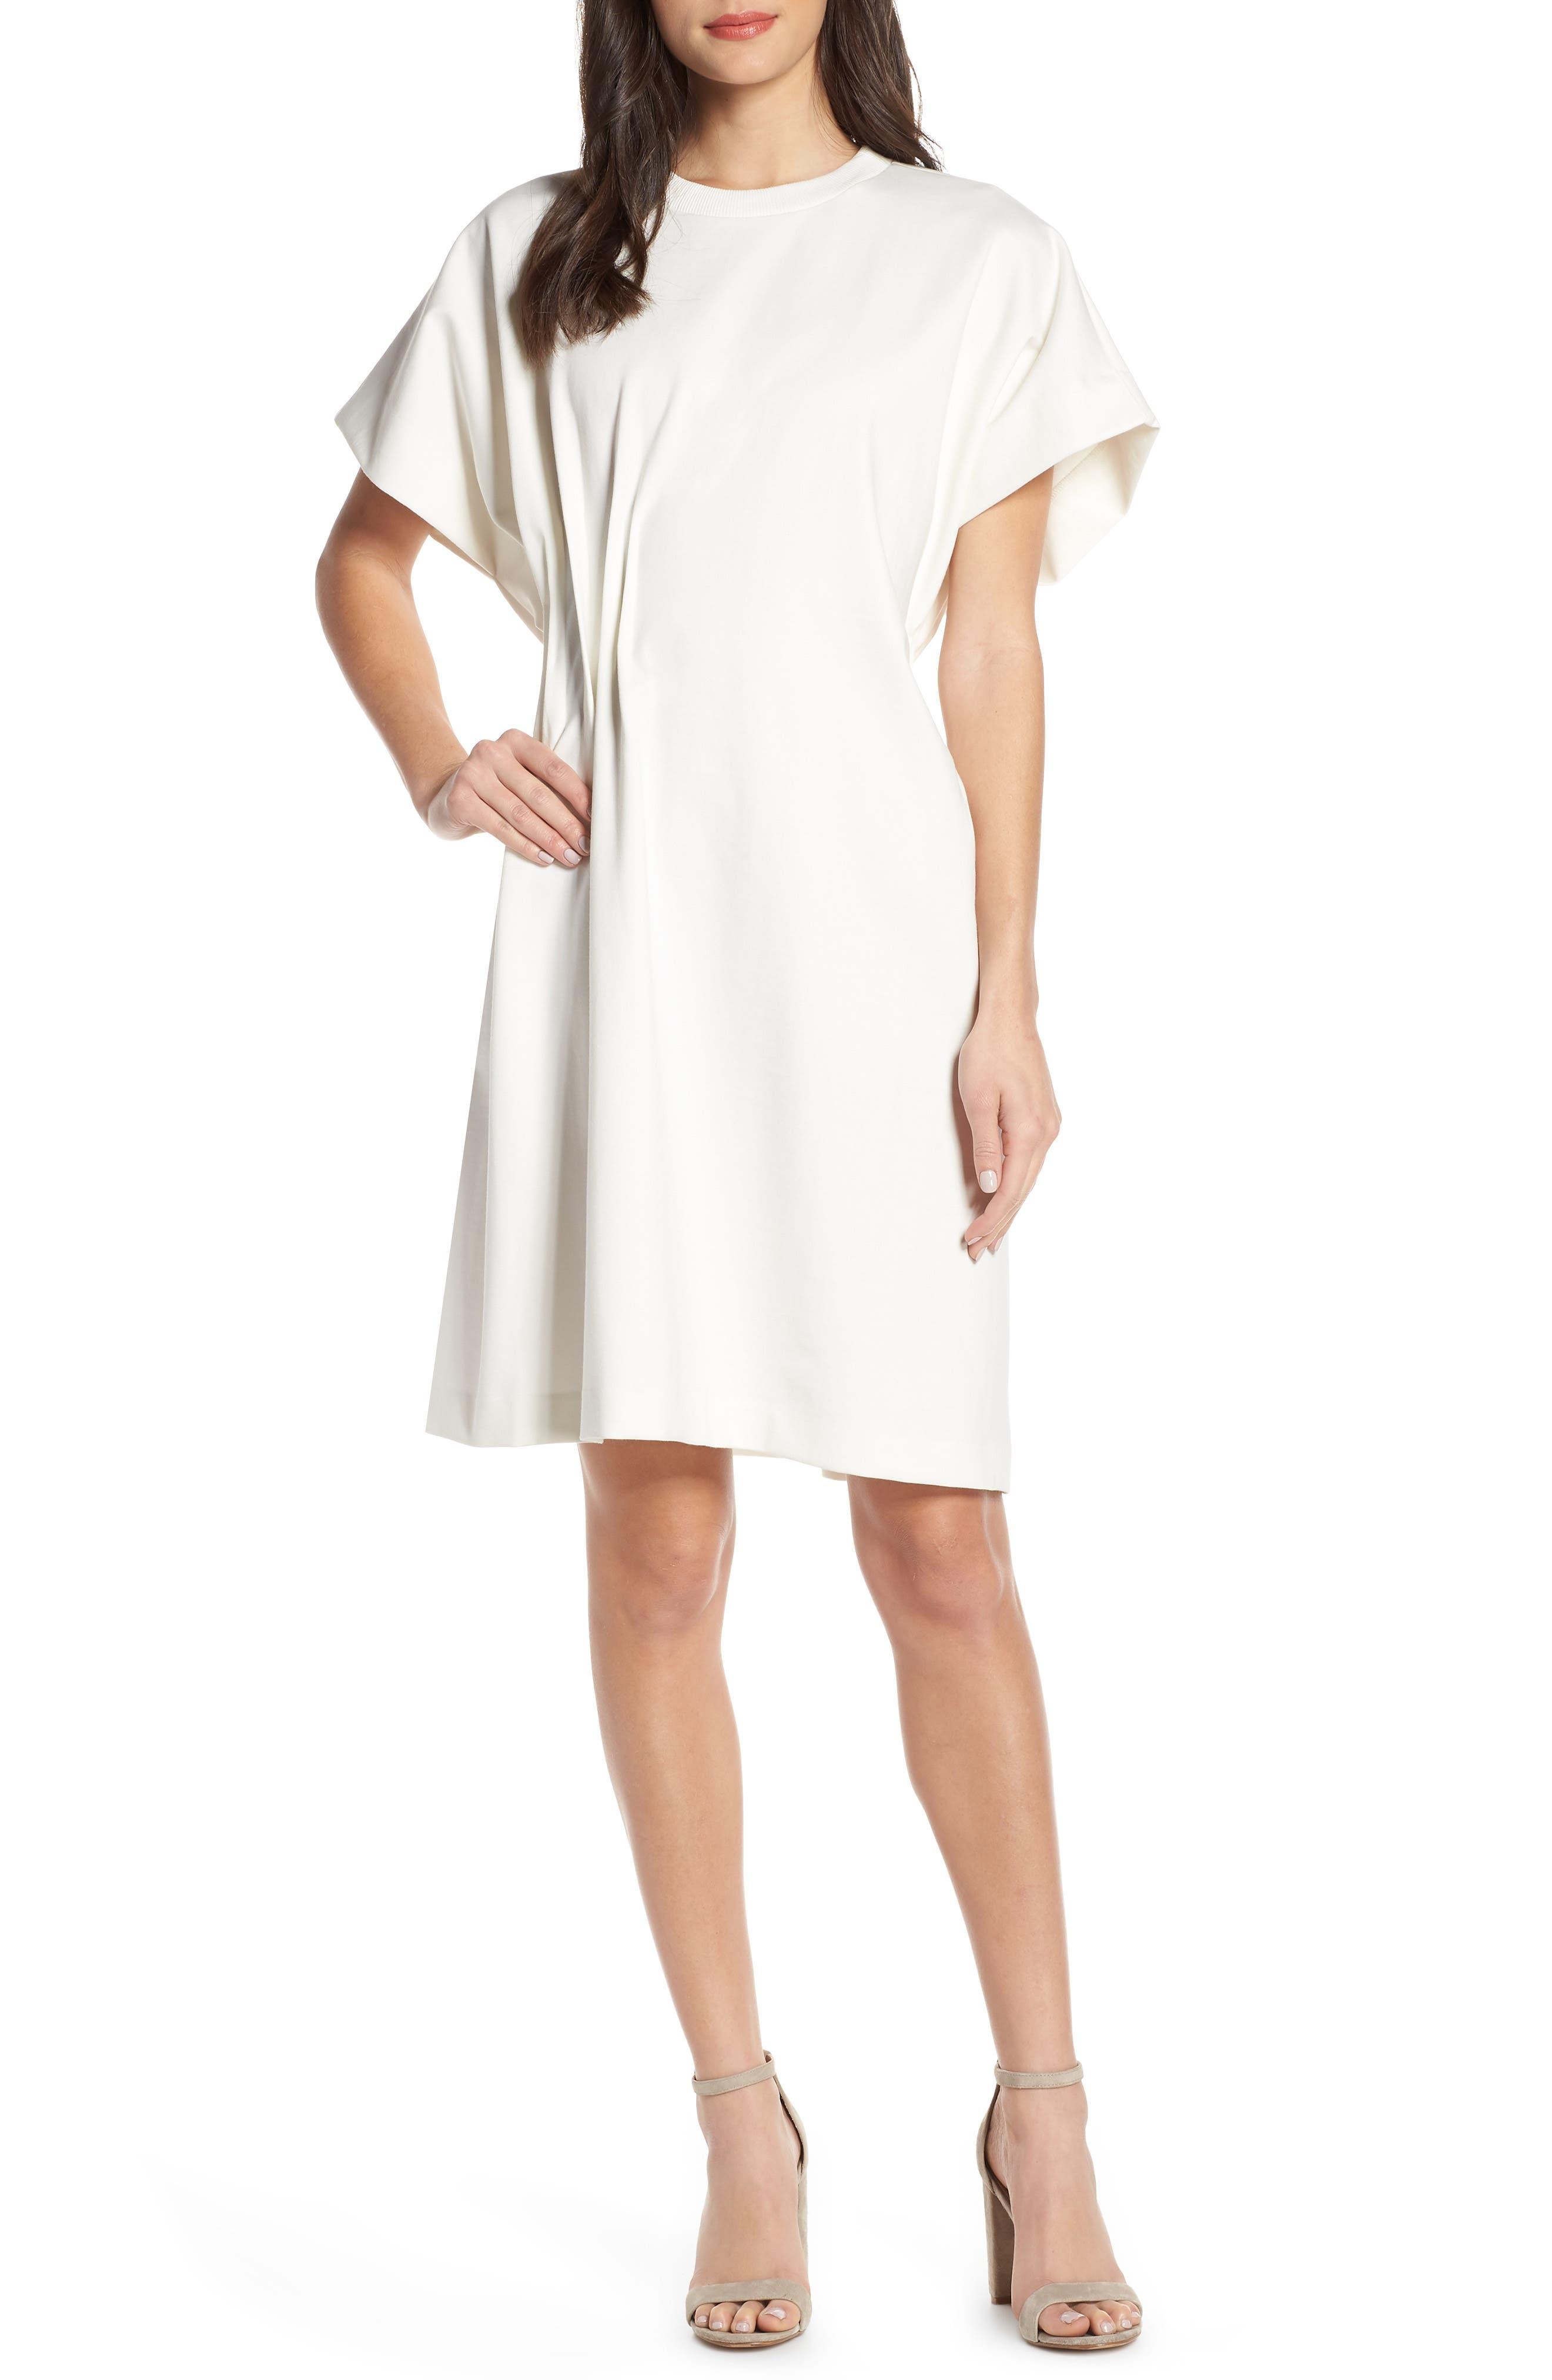 CAARA Looma T-Shirt Dress, Main, color, WHITE